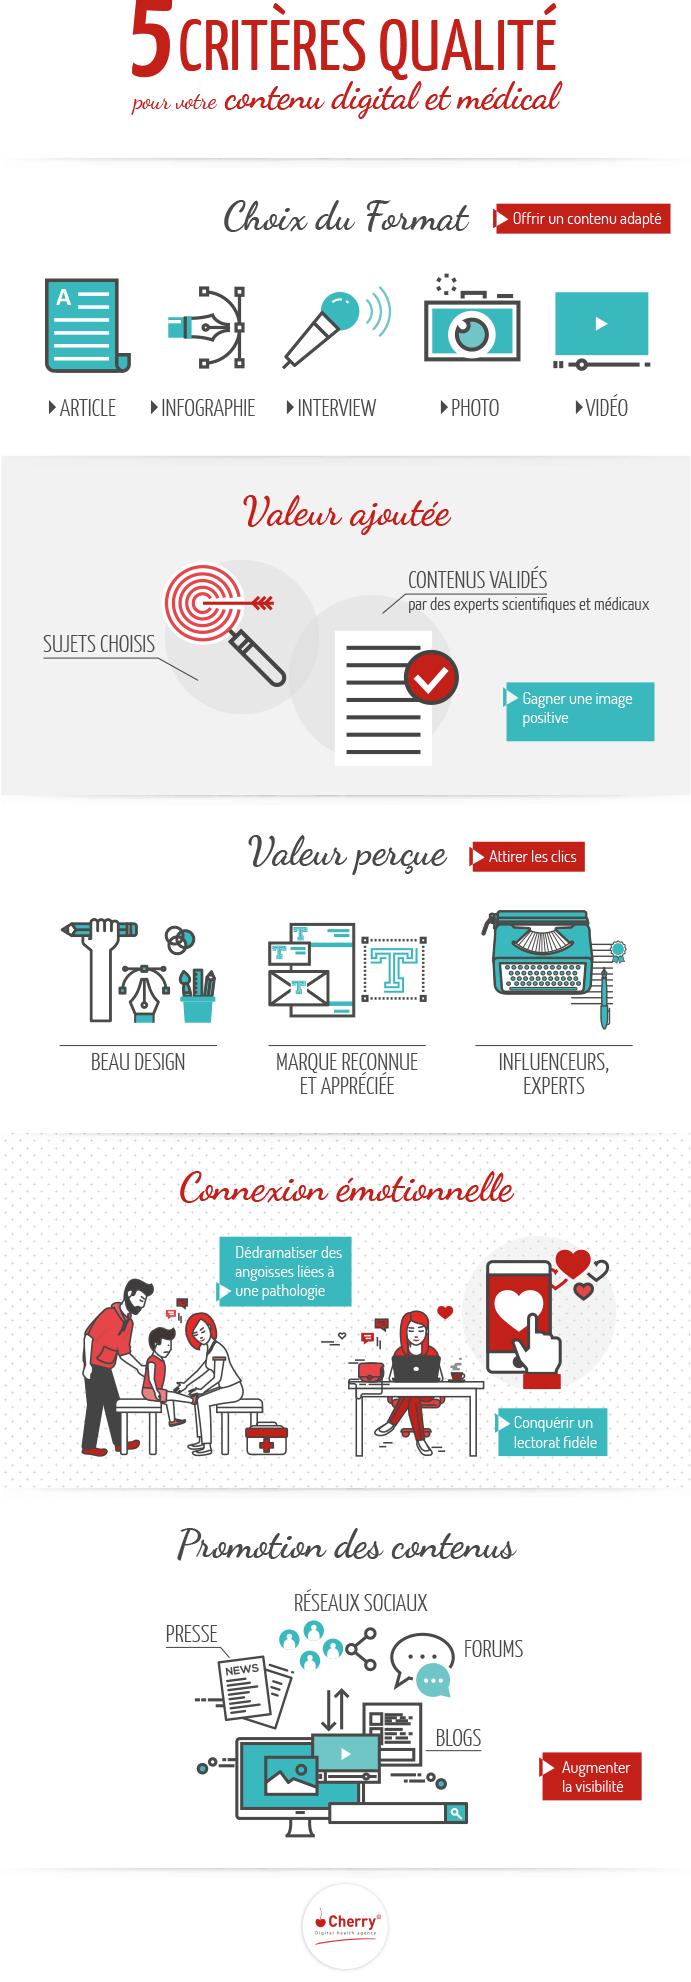 info-critères-qualite-contenu-medical